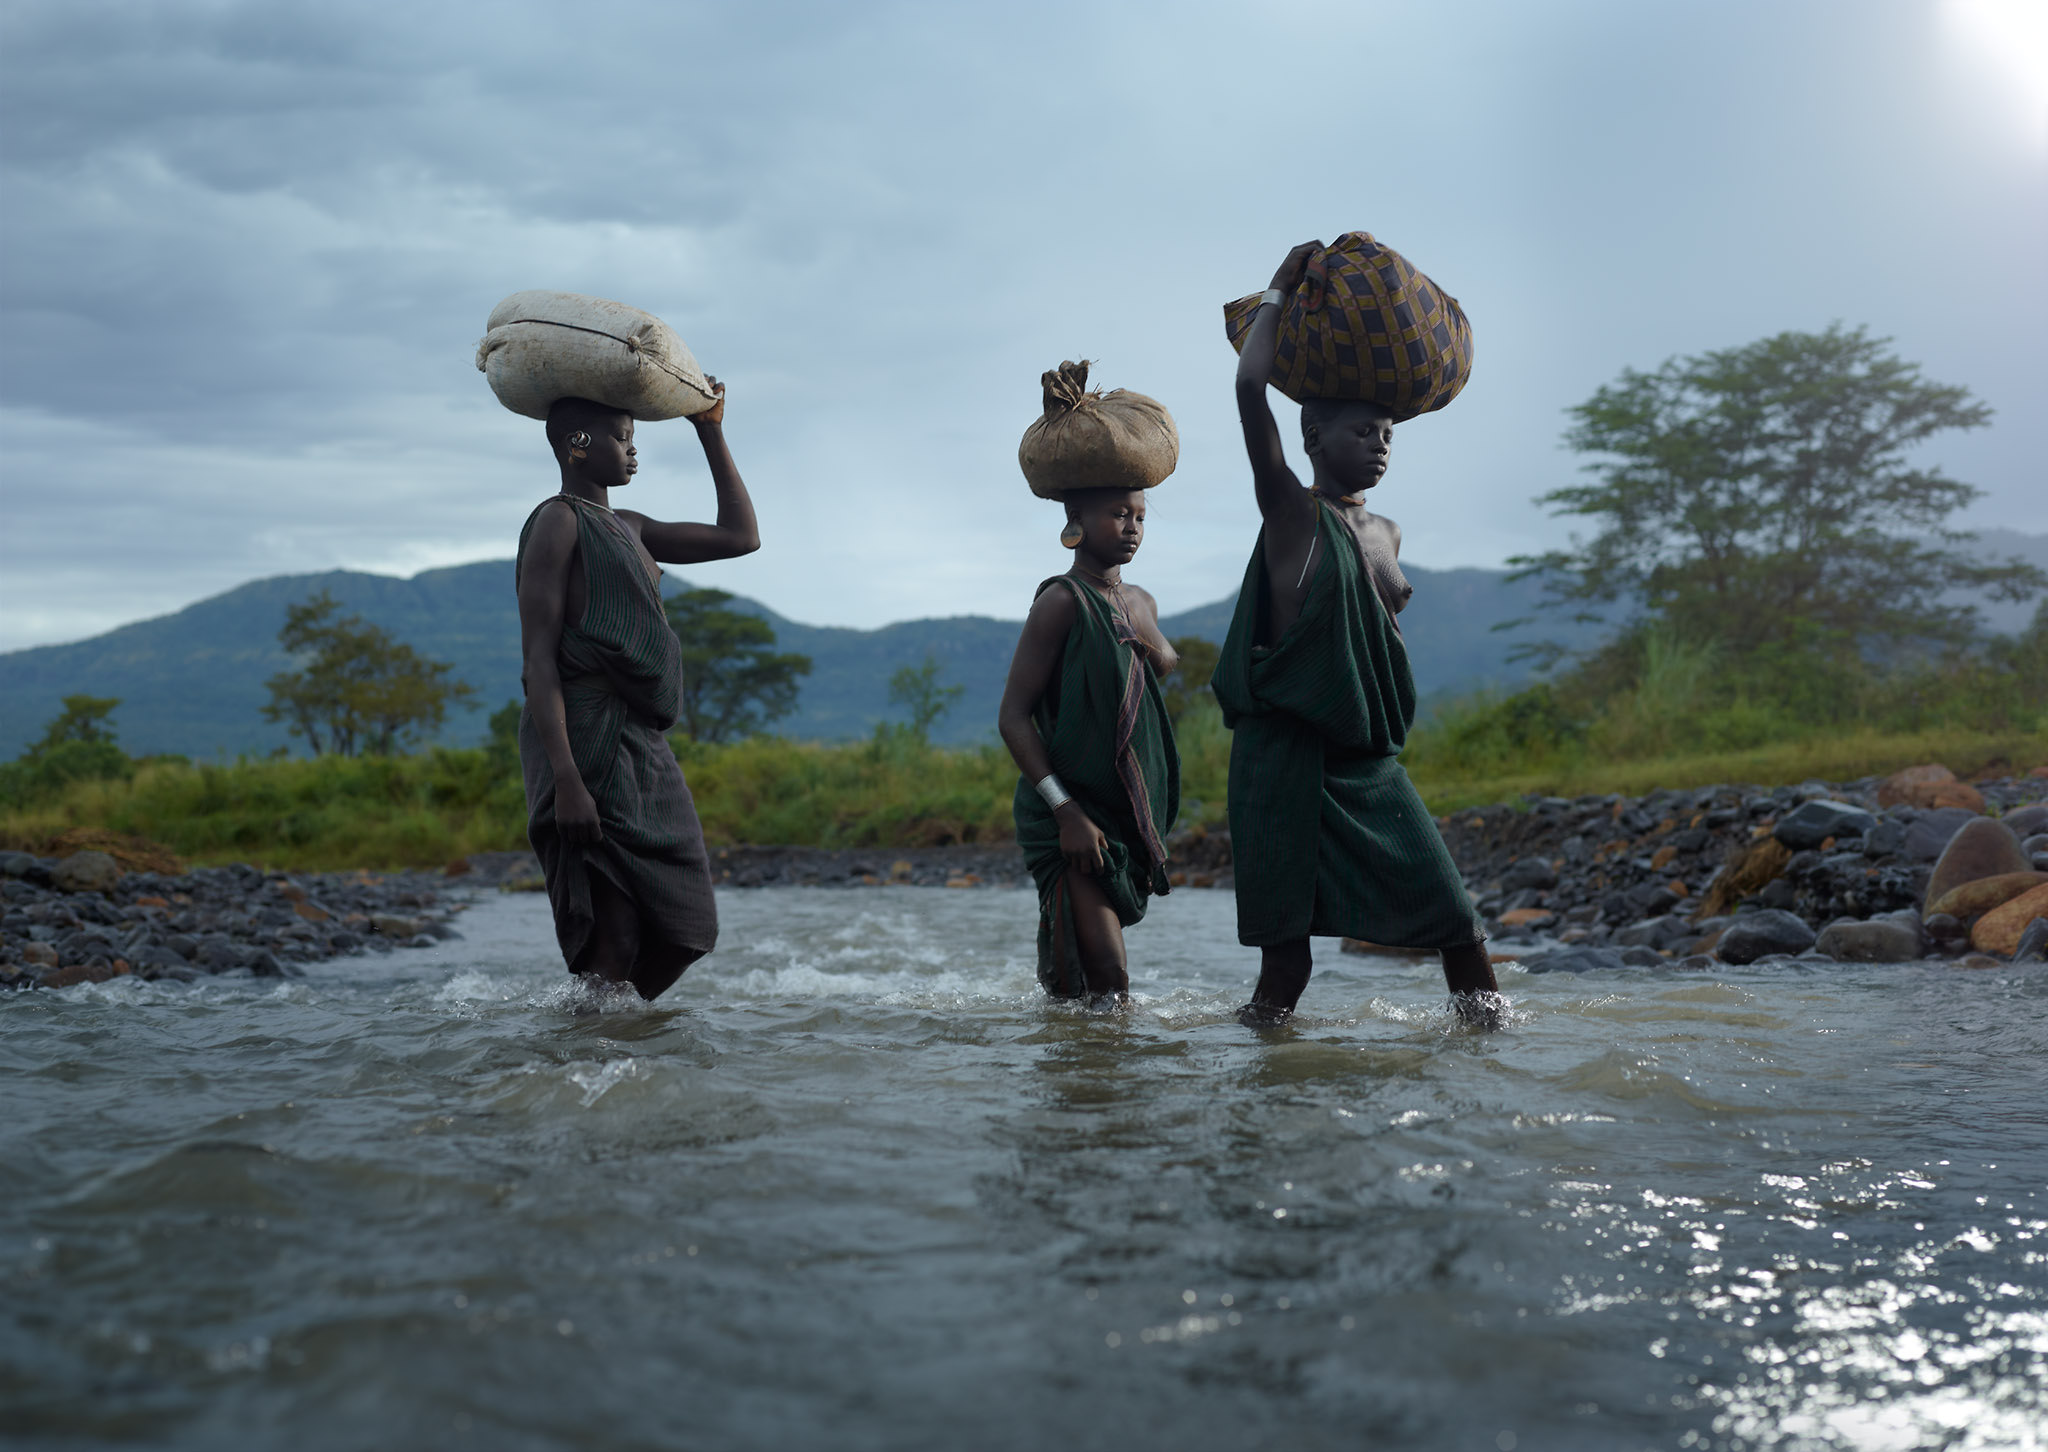 Surma women Naguio, Nabelgoo and Nakoguinea cross Kibbish River. Suri Tribe Territory, Lower Omo Valley, Ethiopia